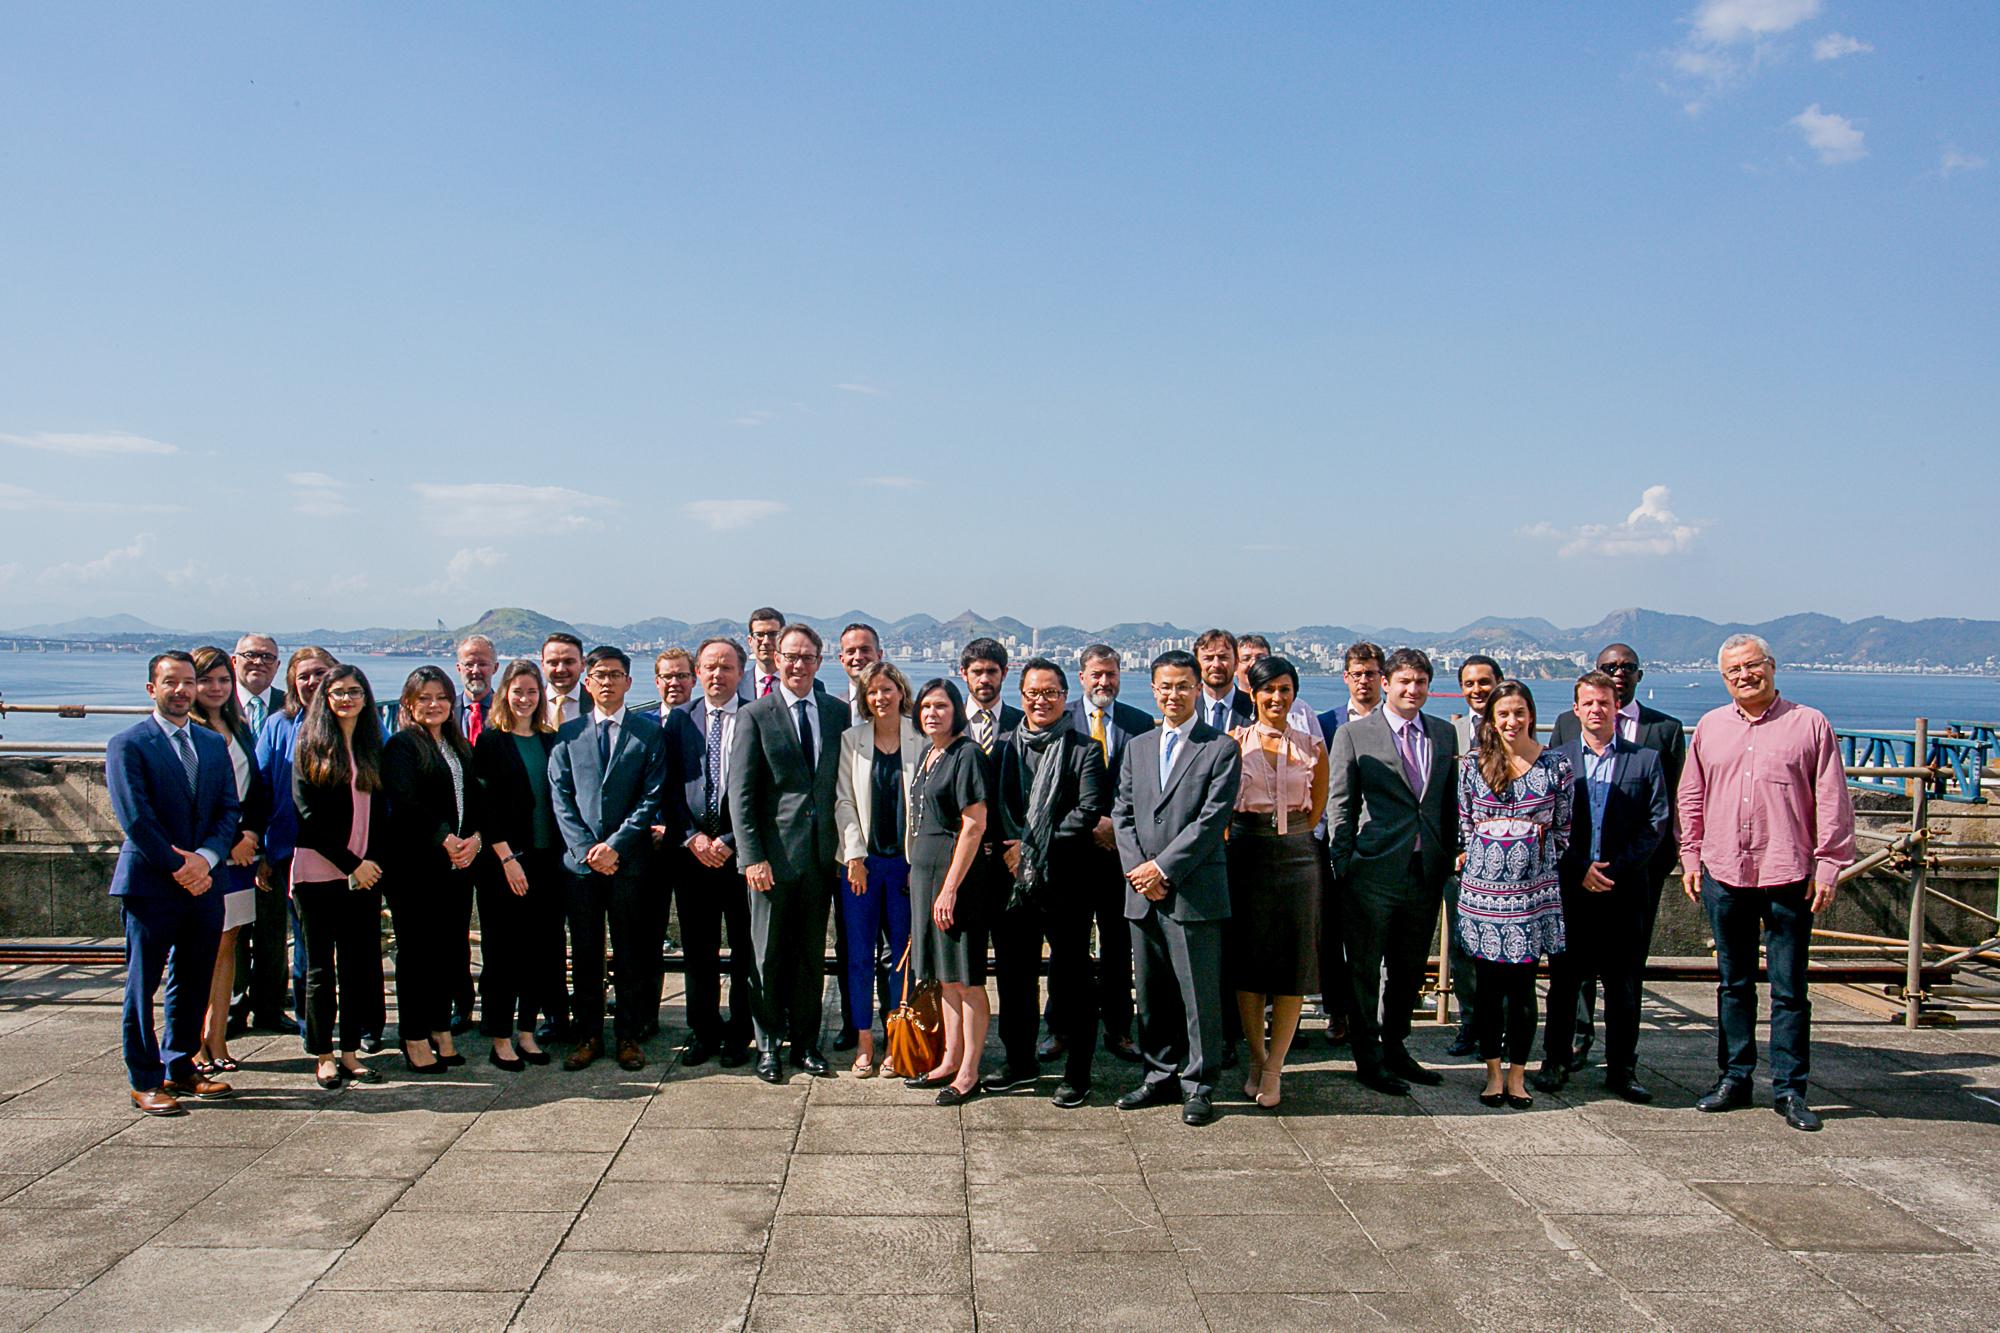 Fourth SIF meeting in Rio de Janeiro